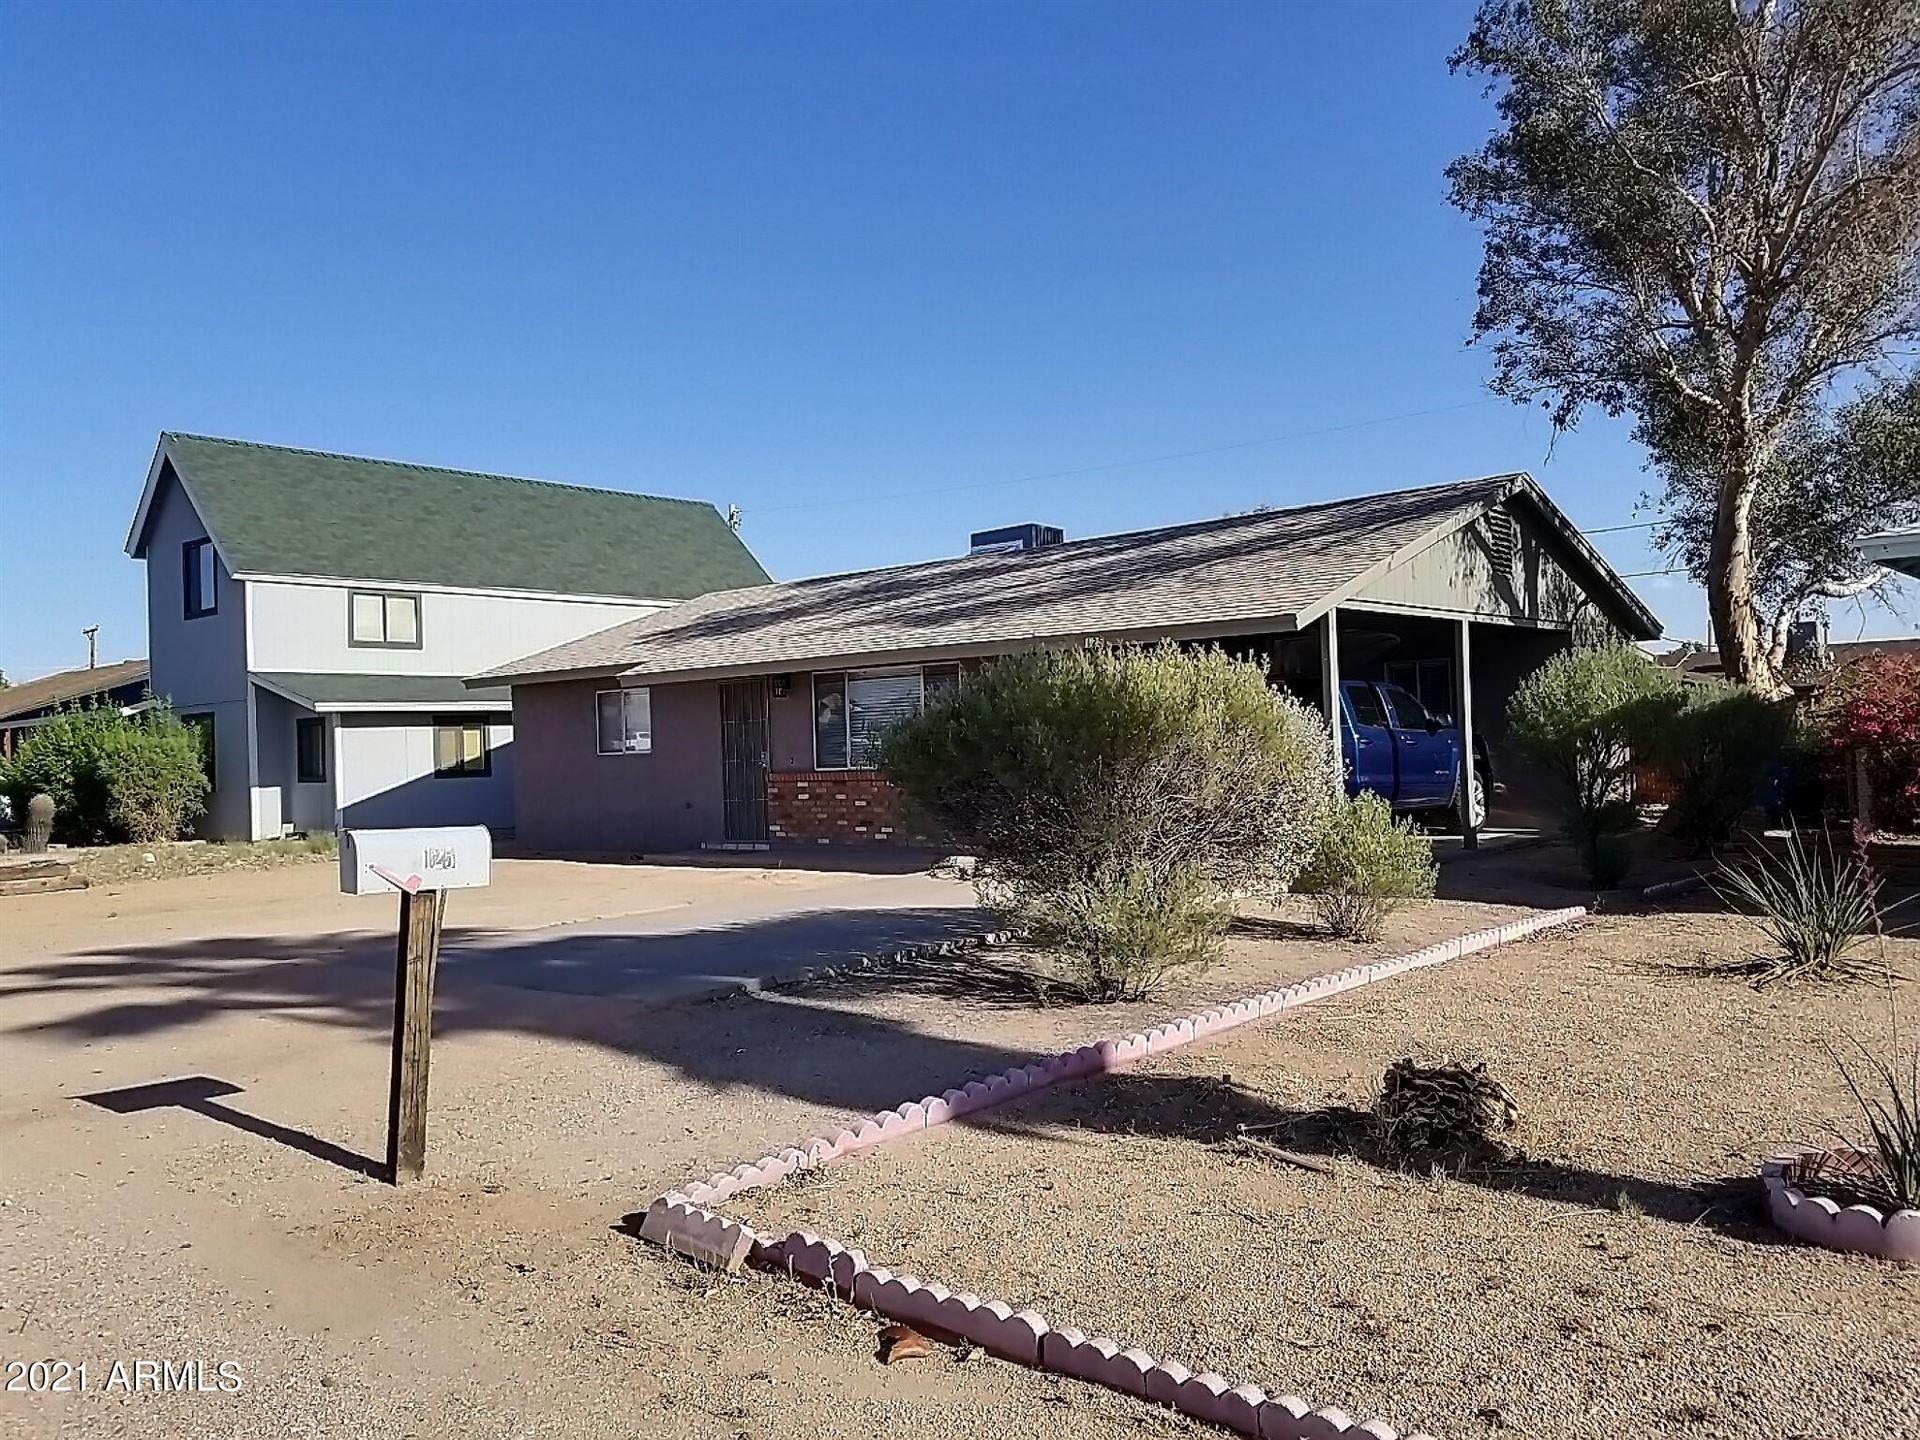 Photo of 125 W 16th Ave Avenue, Apache Junction, AZ 85120 (MLS # 6220019)